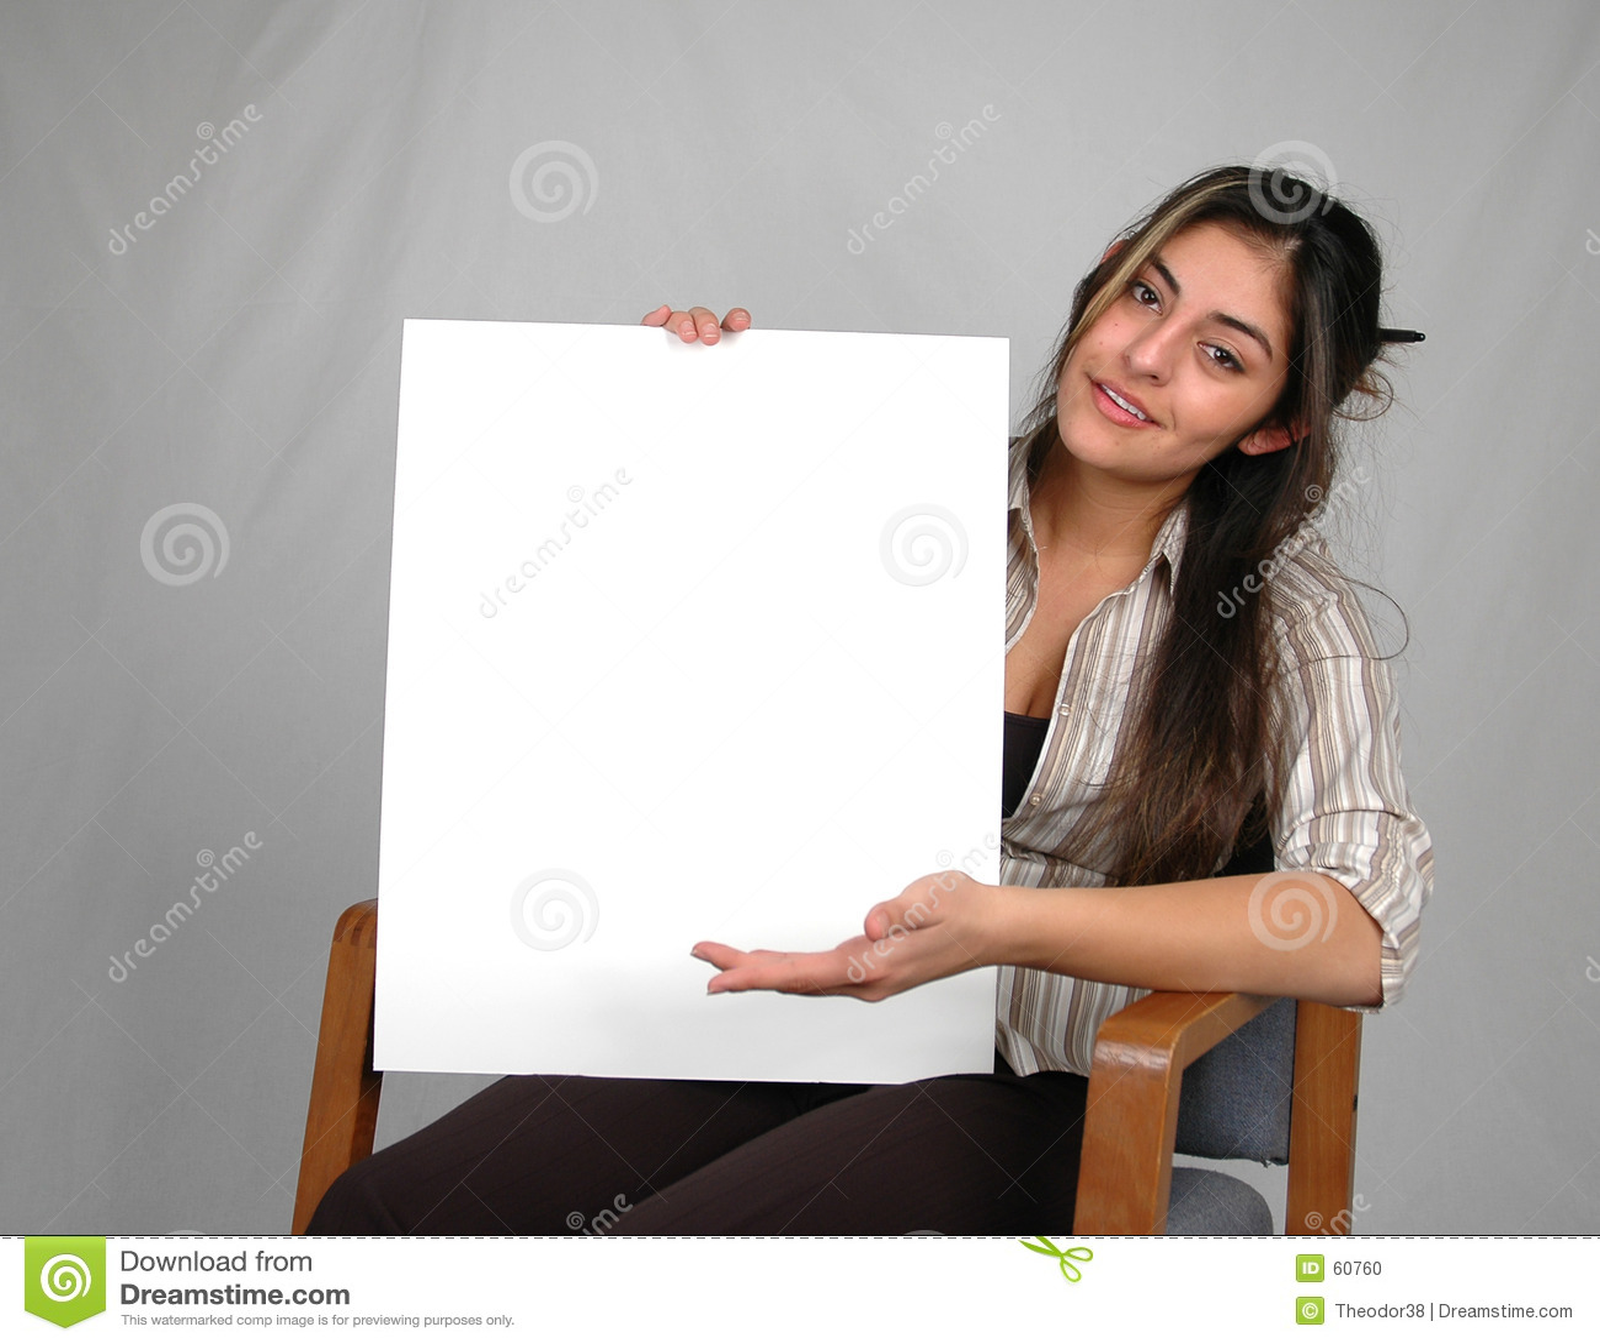 Board-6 in bianco